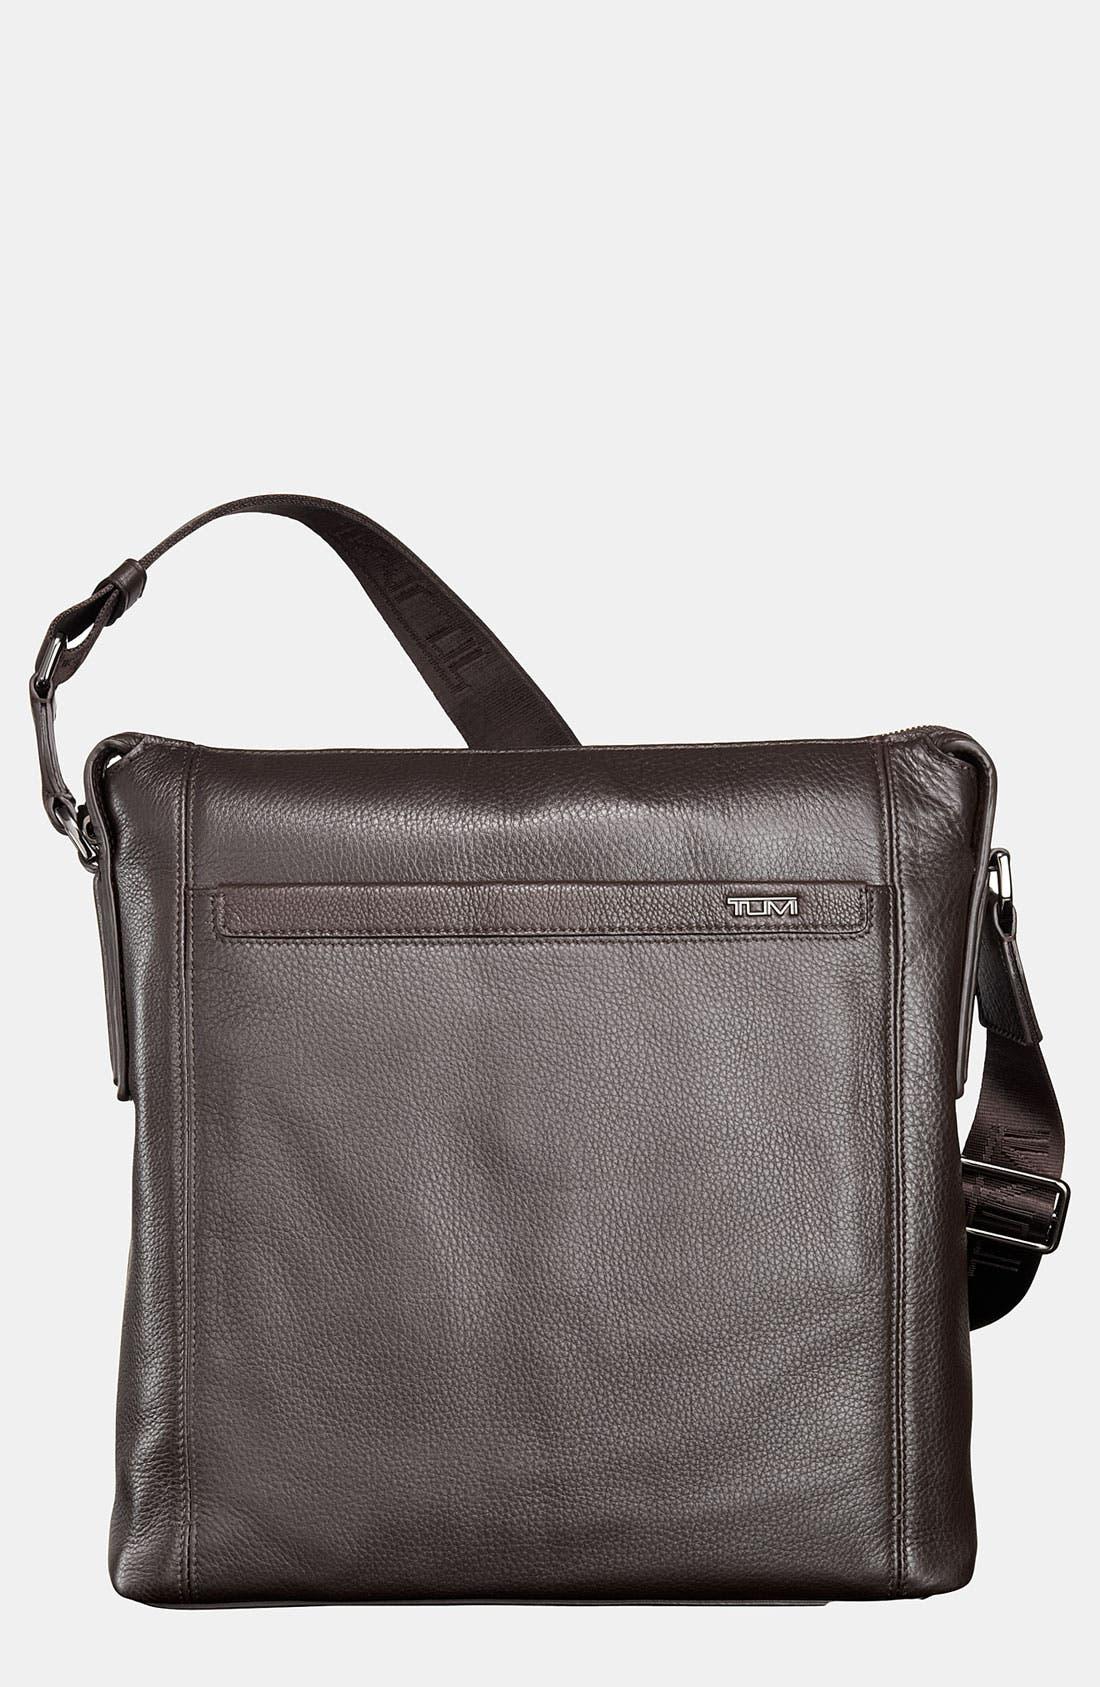 Alternate Image 1 Selected - Tumi 'Centro - Venezia' Crossbody Bag